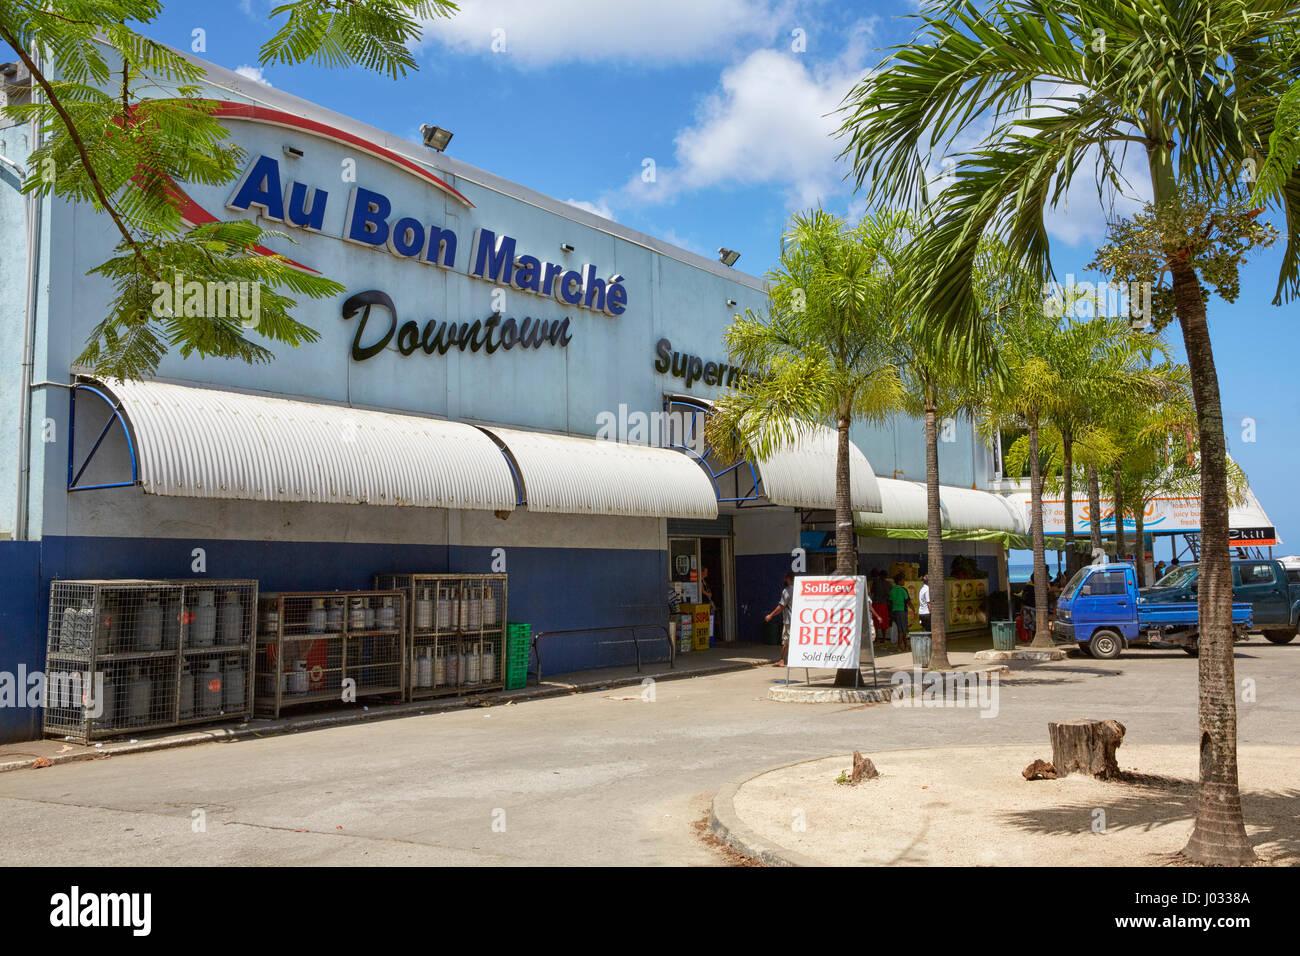 Au Bon Marche Supermarket, Port Vila, Efate Island, Vanuatu Stock Photo